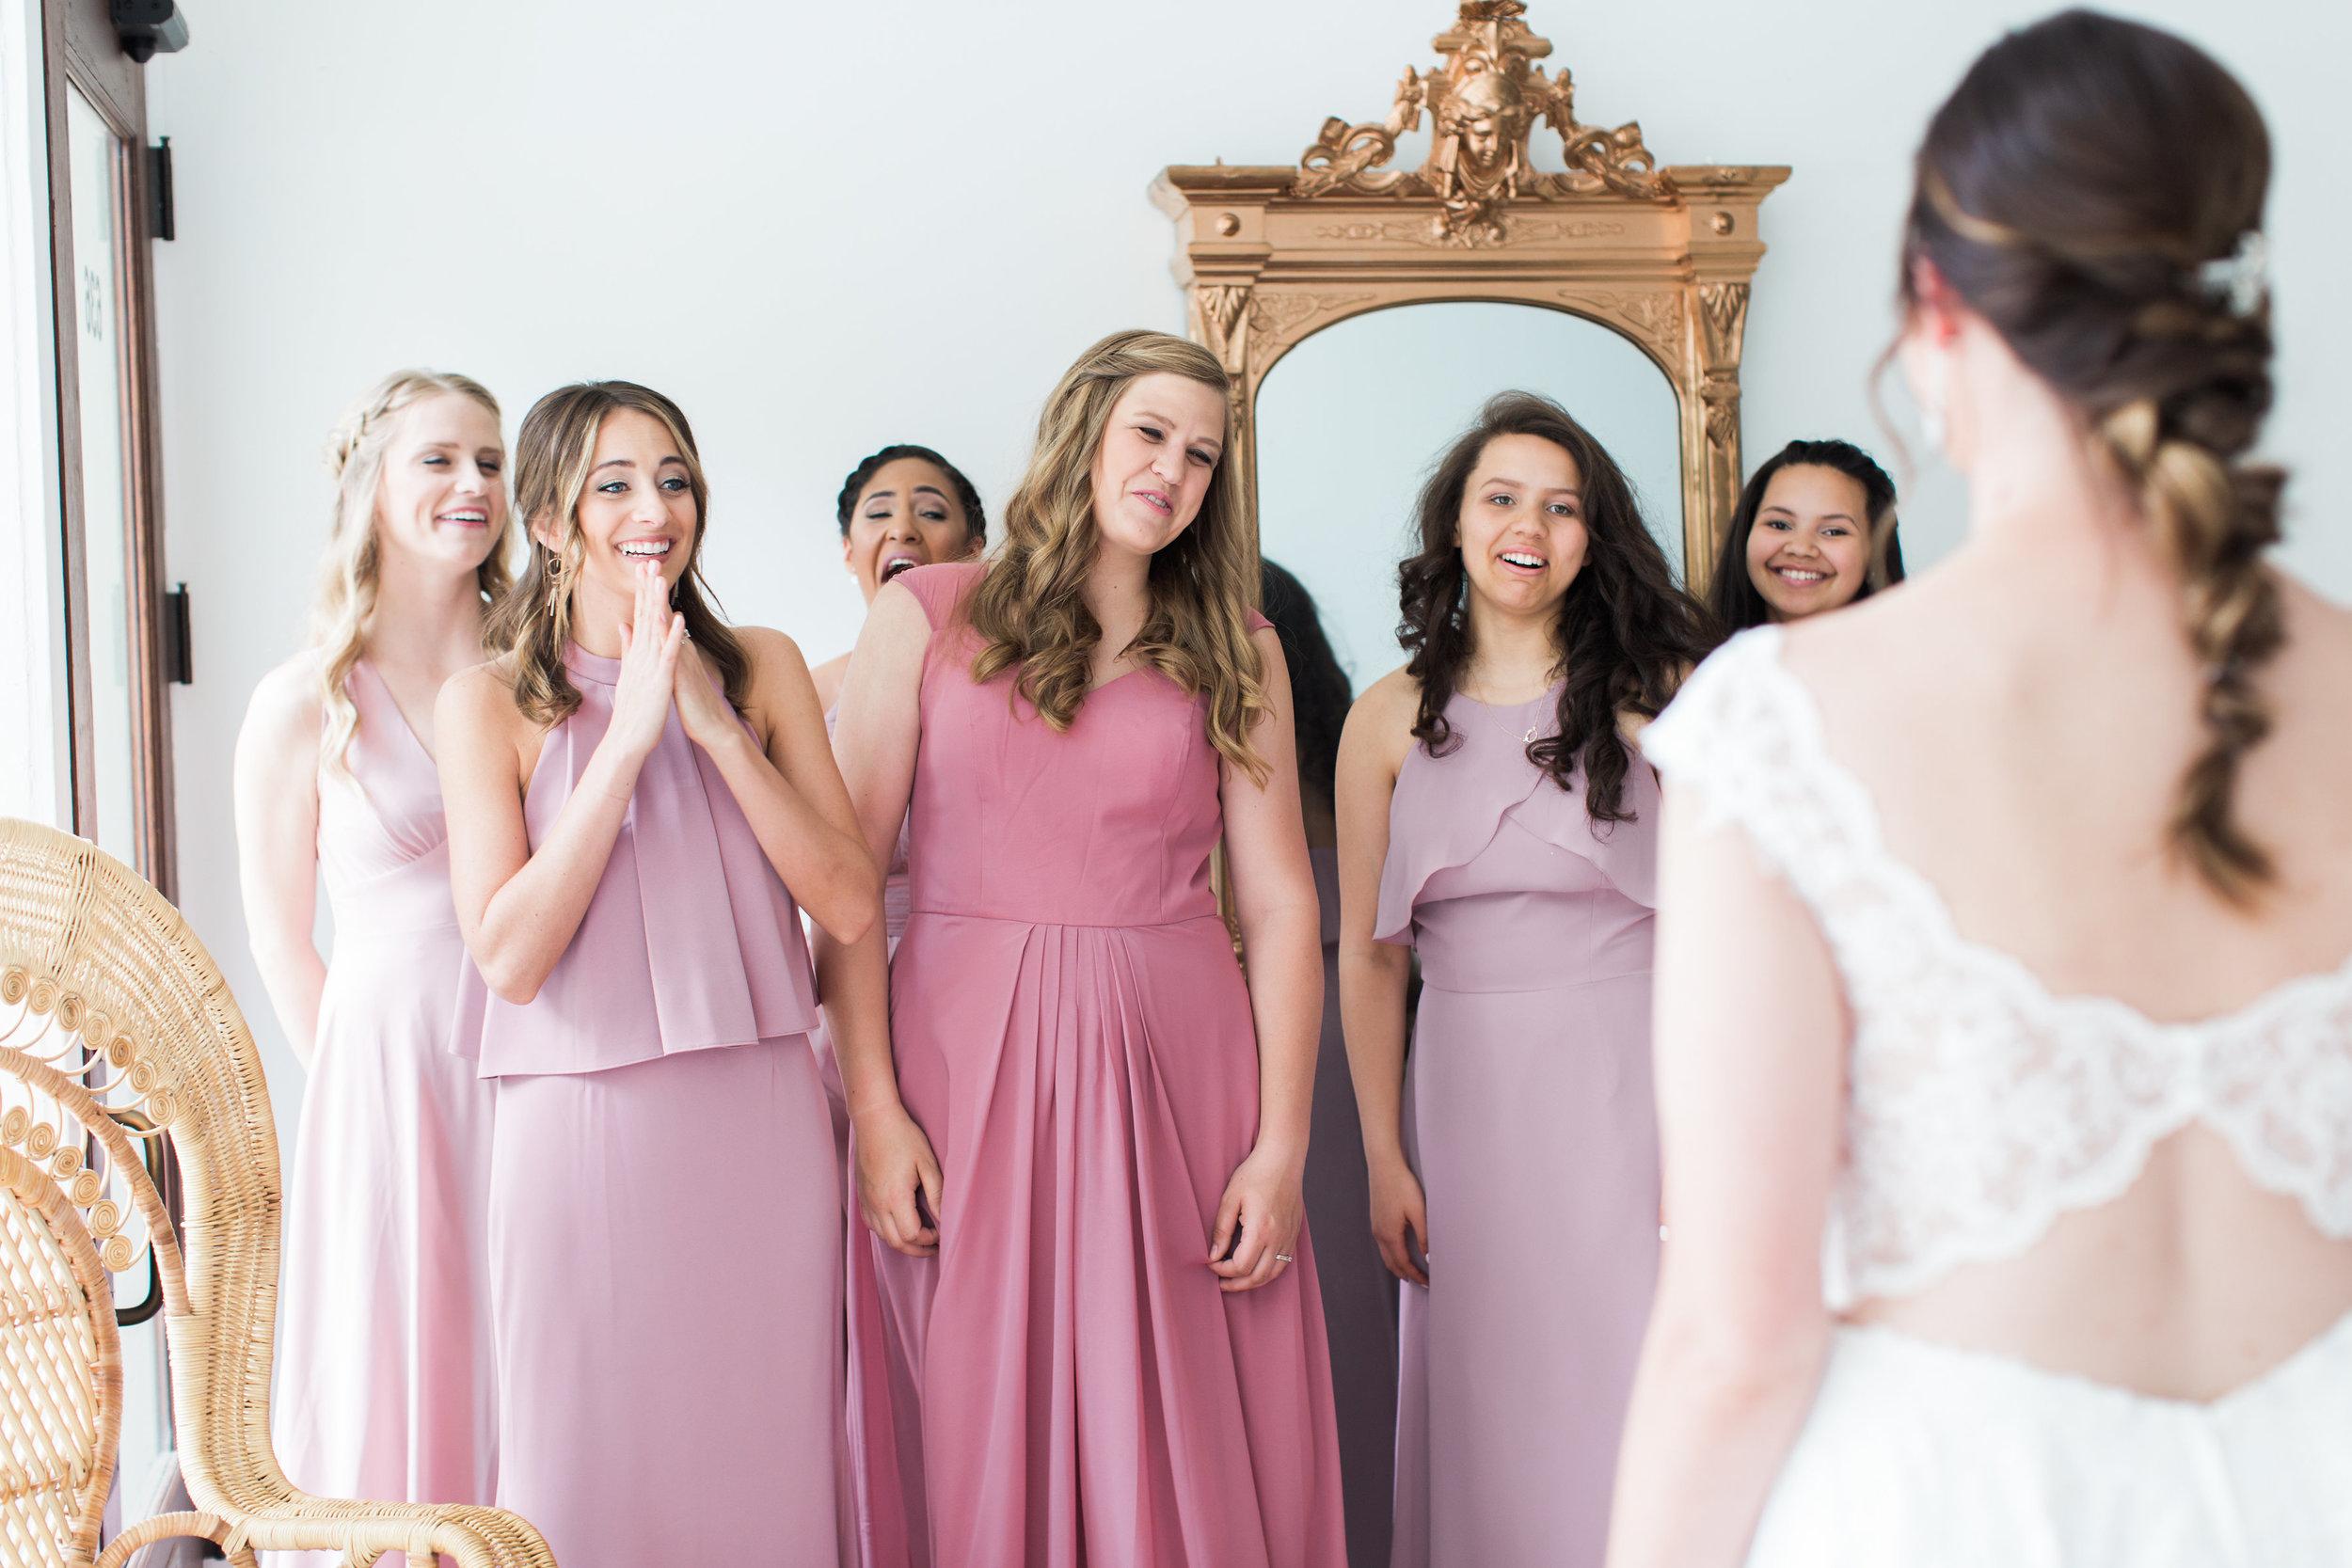 Julius+Wedding+GettingReady+Girls-130.jpg